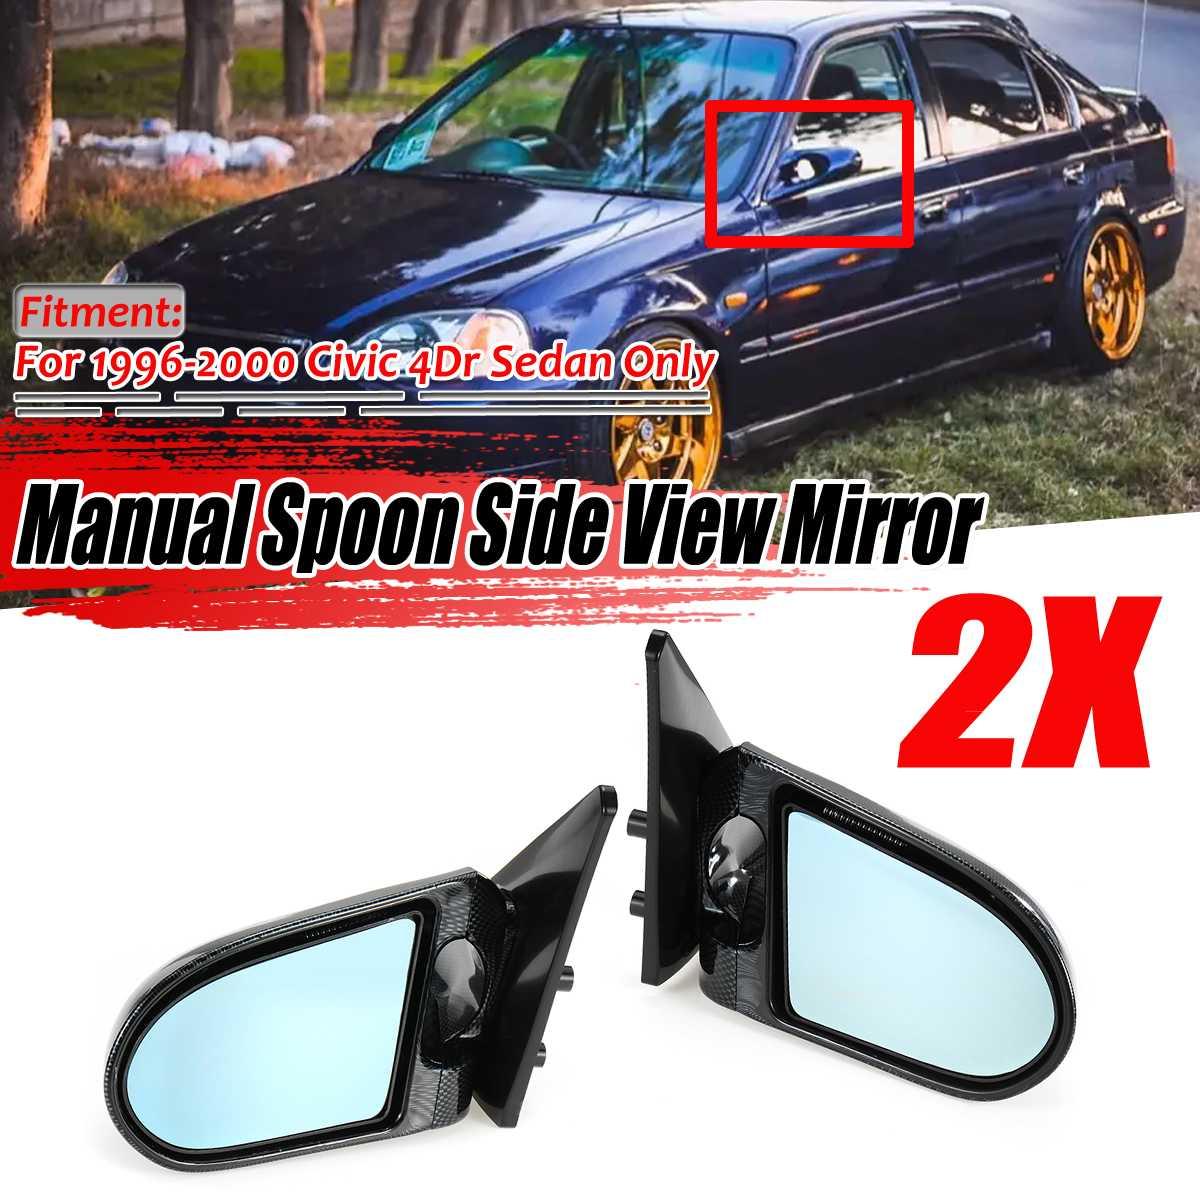 Auto Parts and Vehicles Car & Truck Exterior Mirrors Fit Honda 92 ...